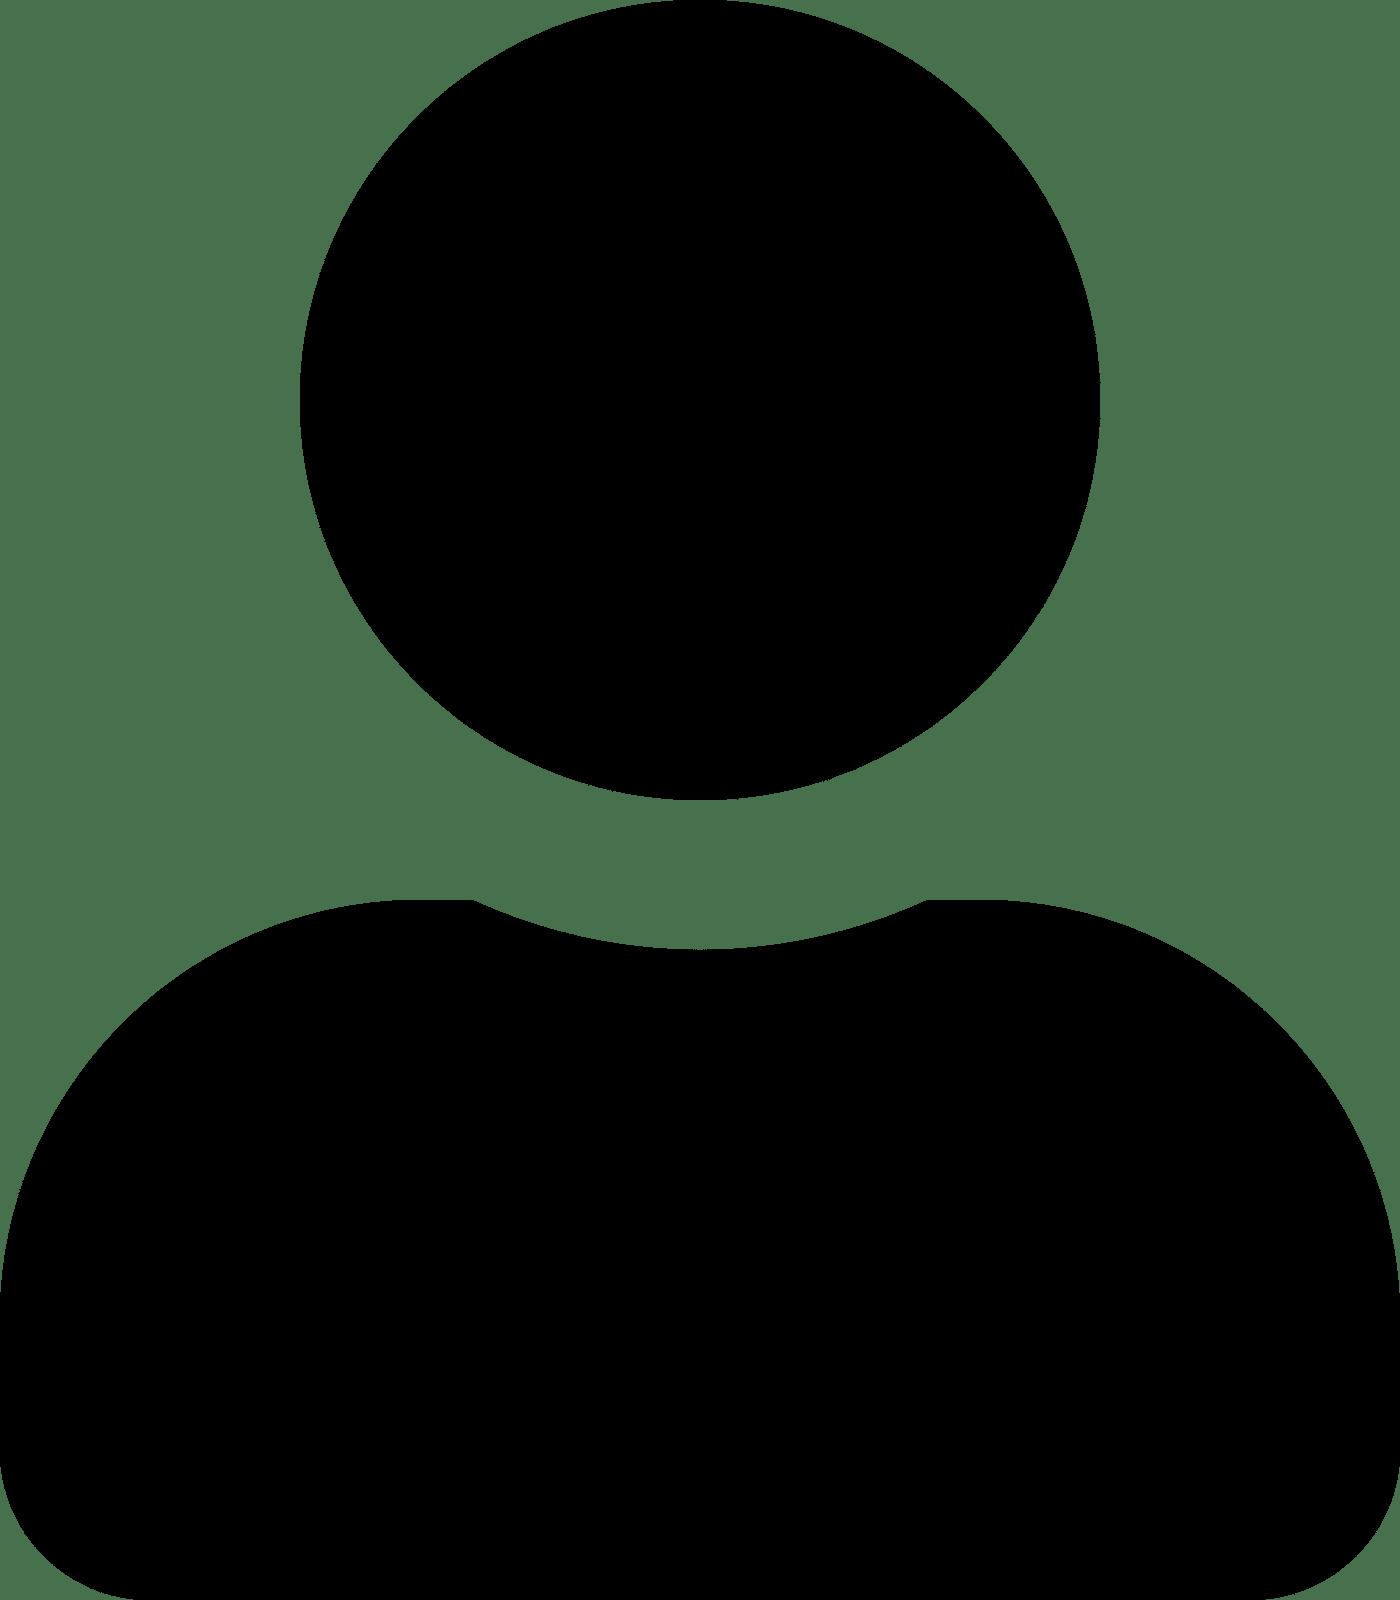 Icone une personne